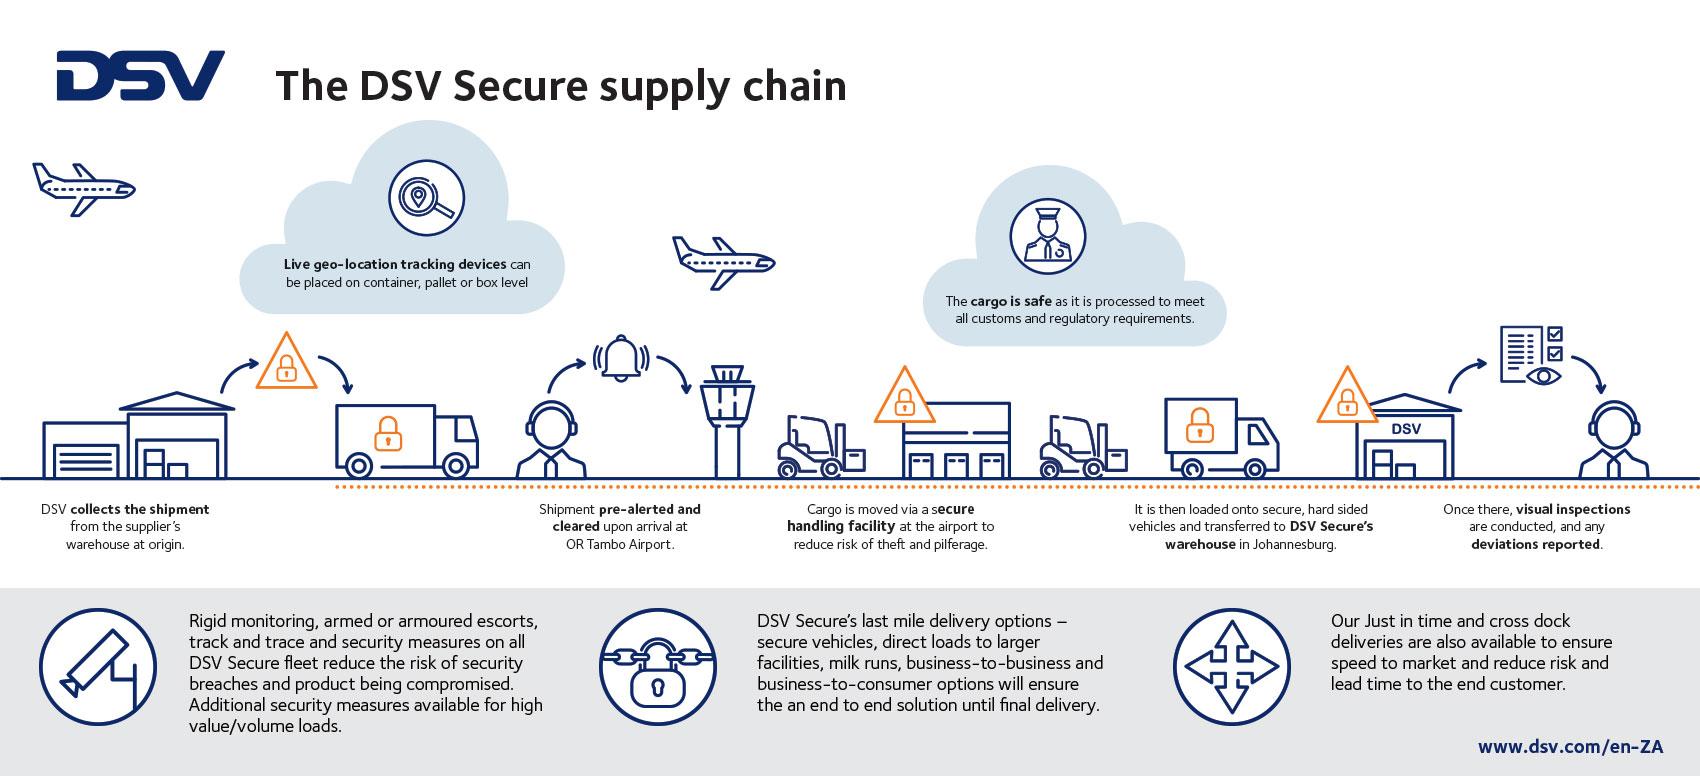 DSV Secure Supply chain process